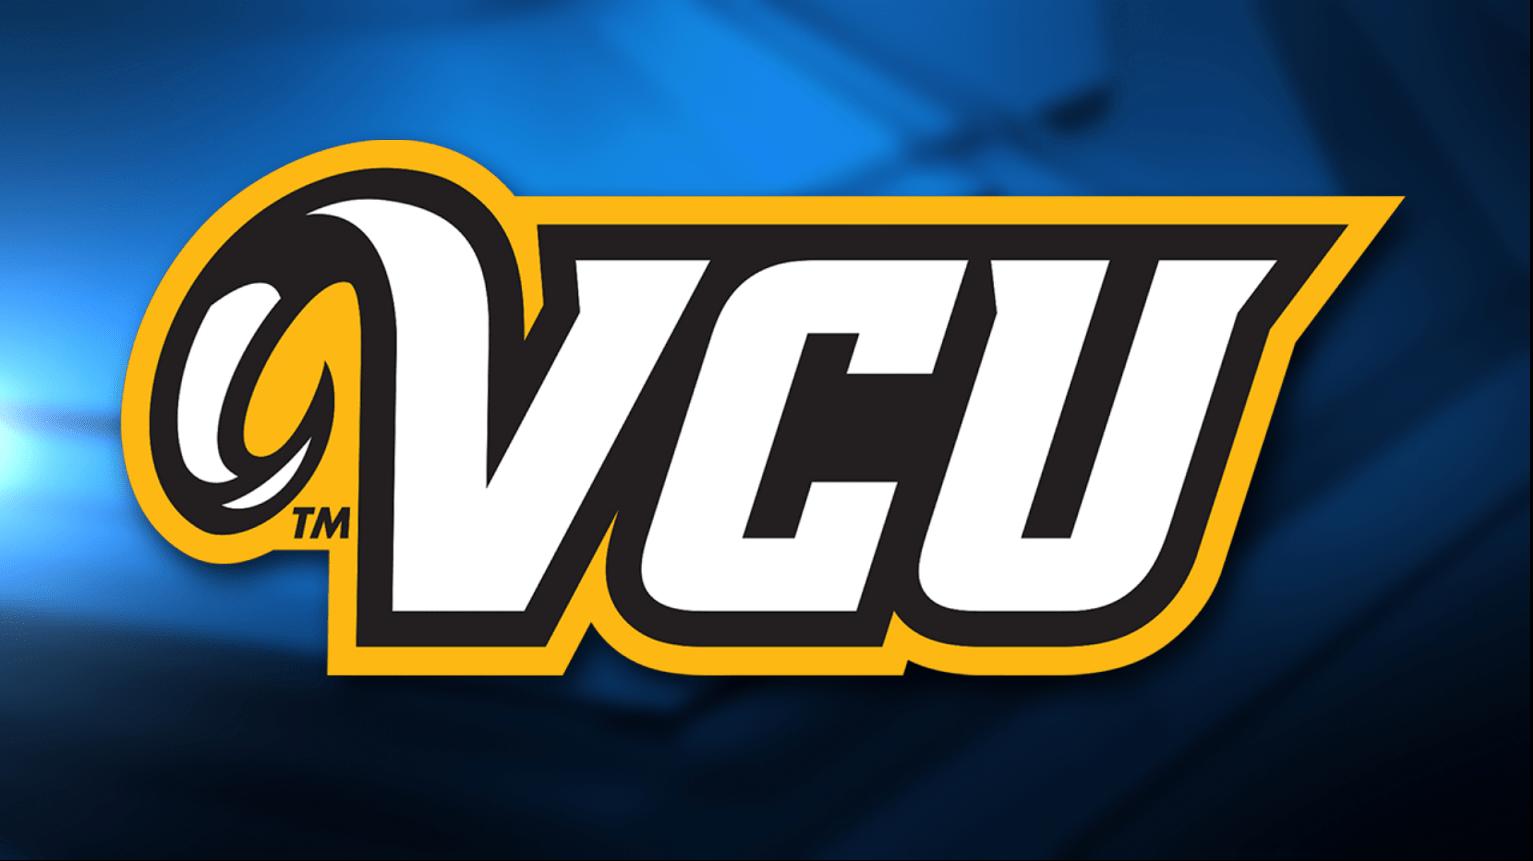 VCU logo 2_1549752632067.PNG.jpg